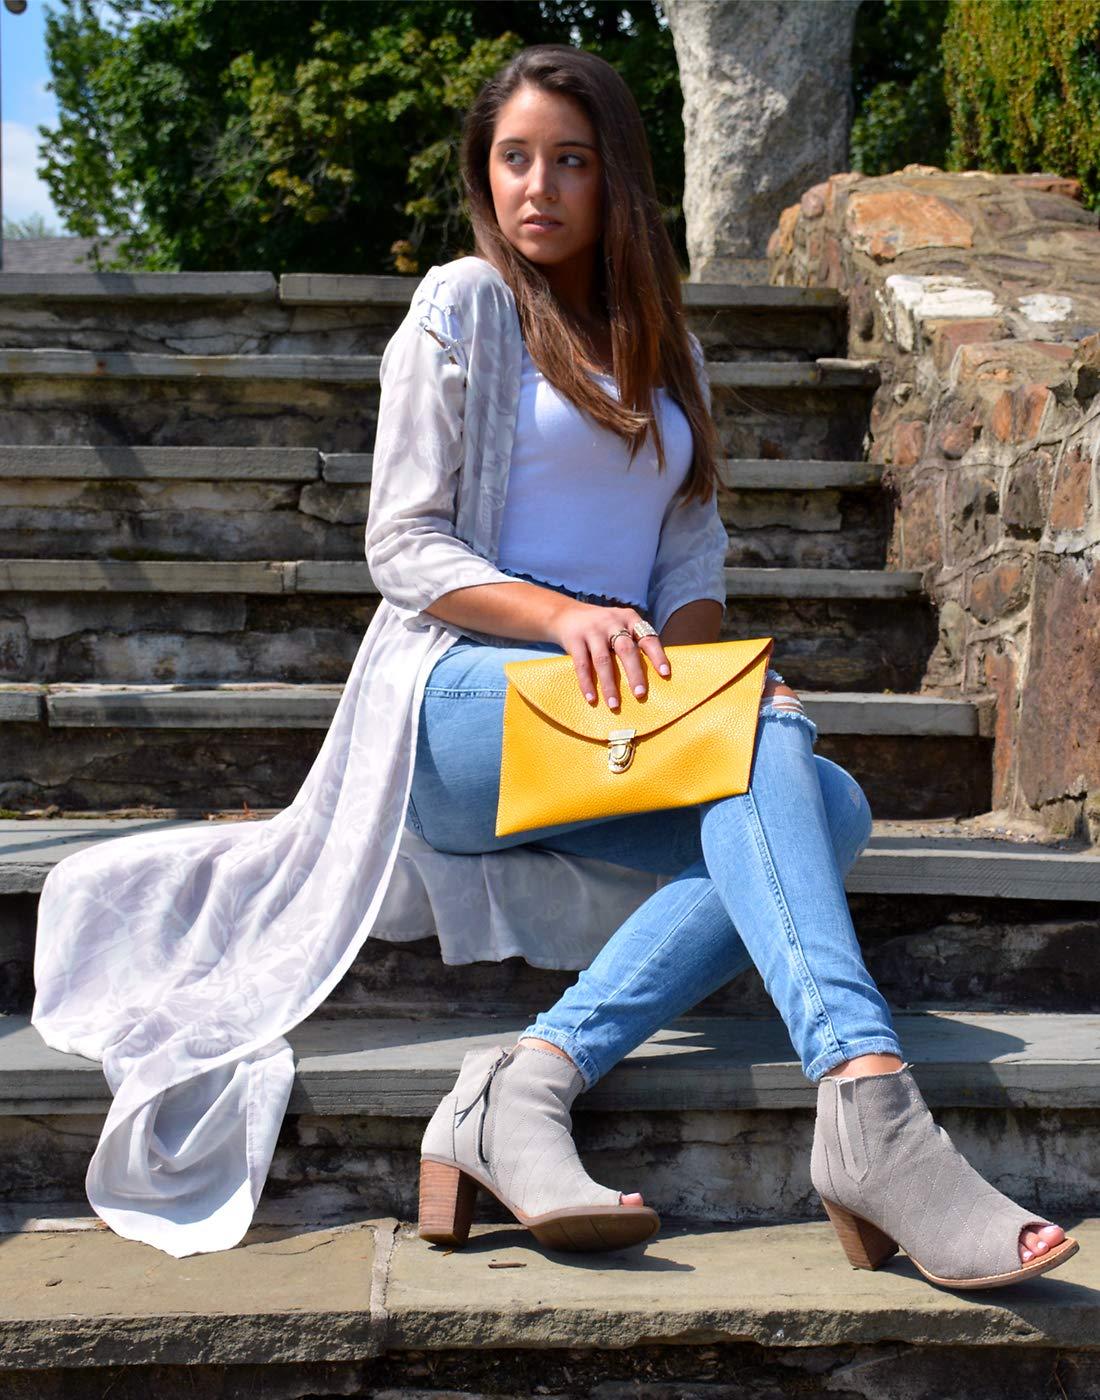 HDE Women's Fashion Cross Body Gold Buckle Purse Vegan Leather Envelope Handbag by HDE (Image #3)